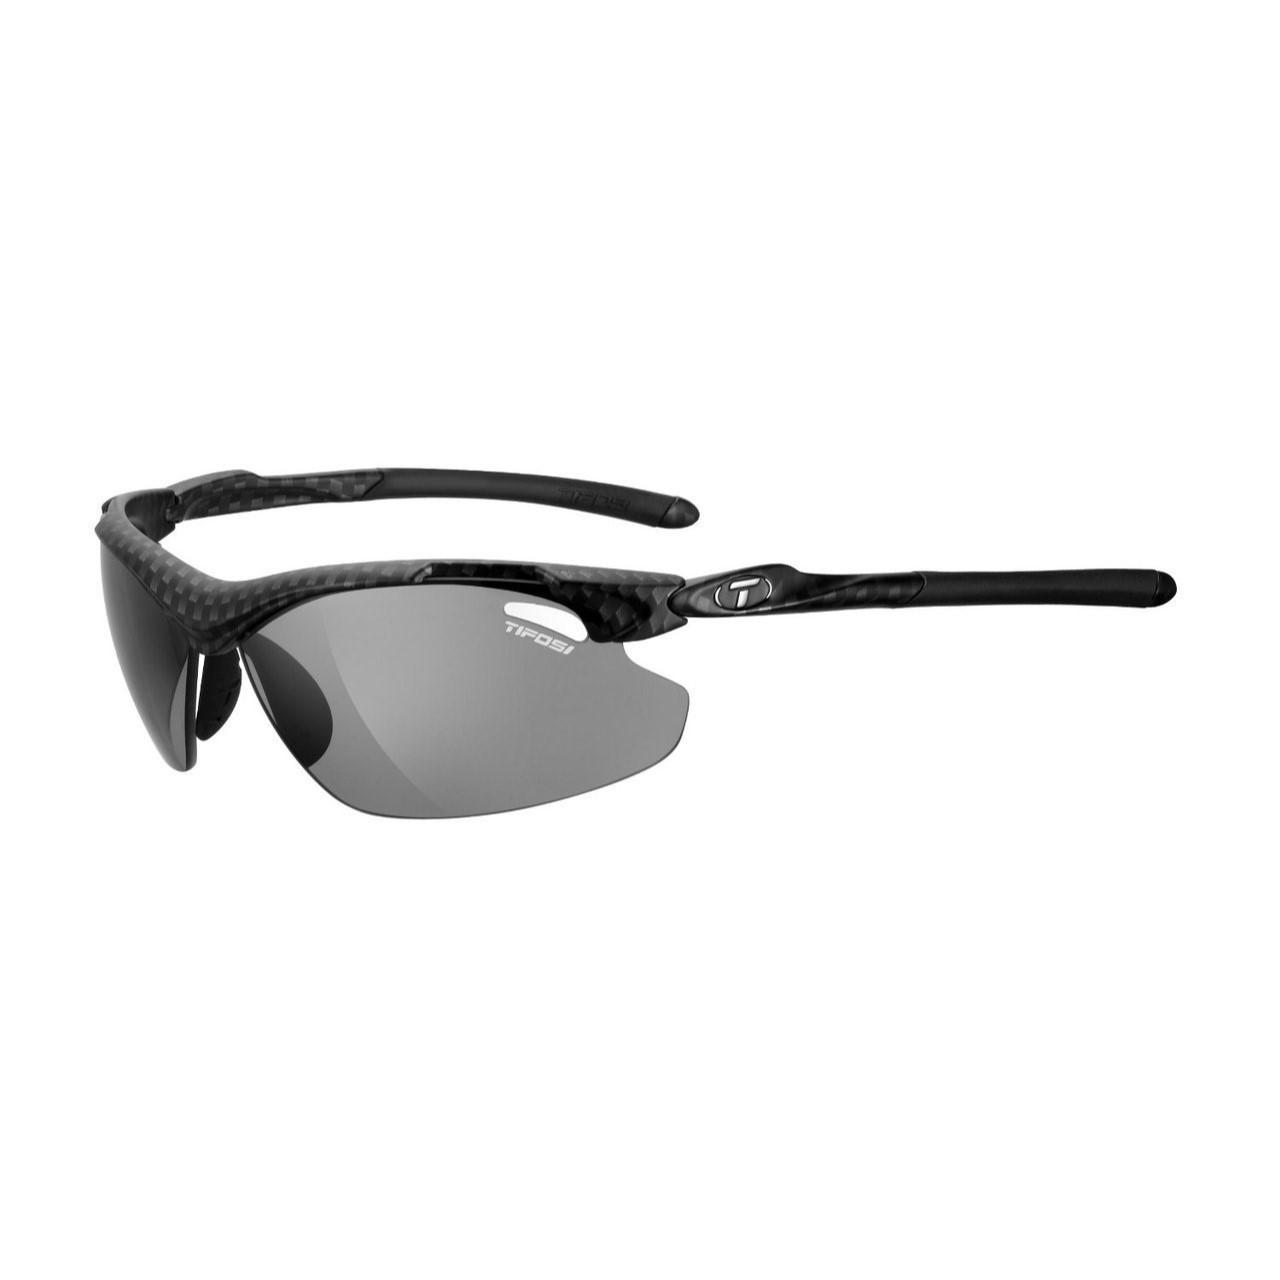 0ca86b9ba41 Tifosi Tyrant 2.0 Sunglasses with Smoke Polarized Fototec Lens - 2019 -  Triathlete Sports